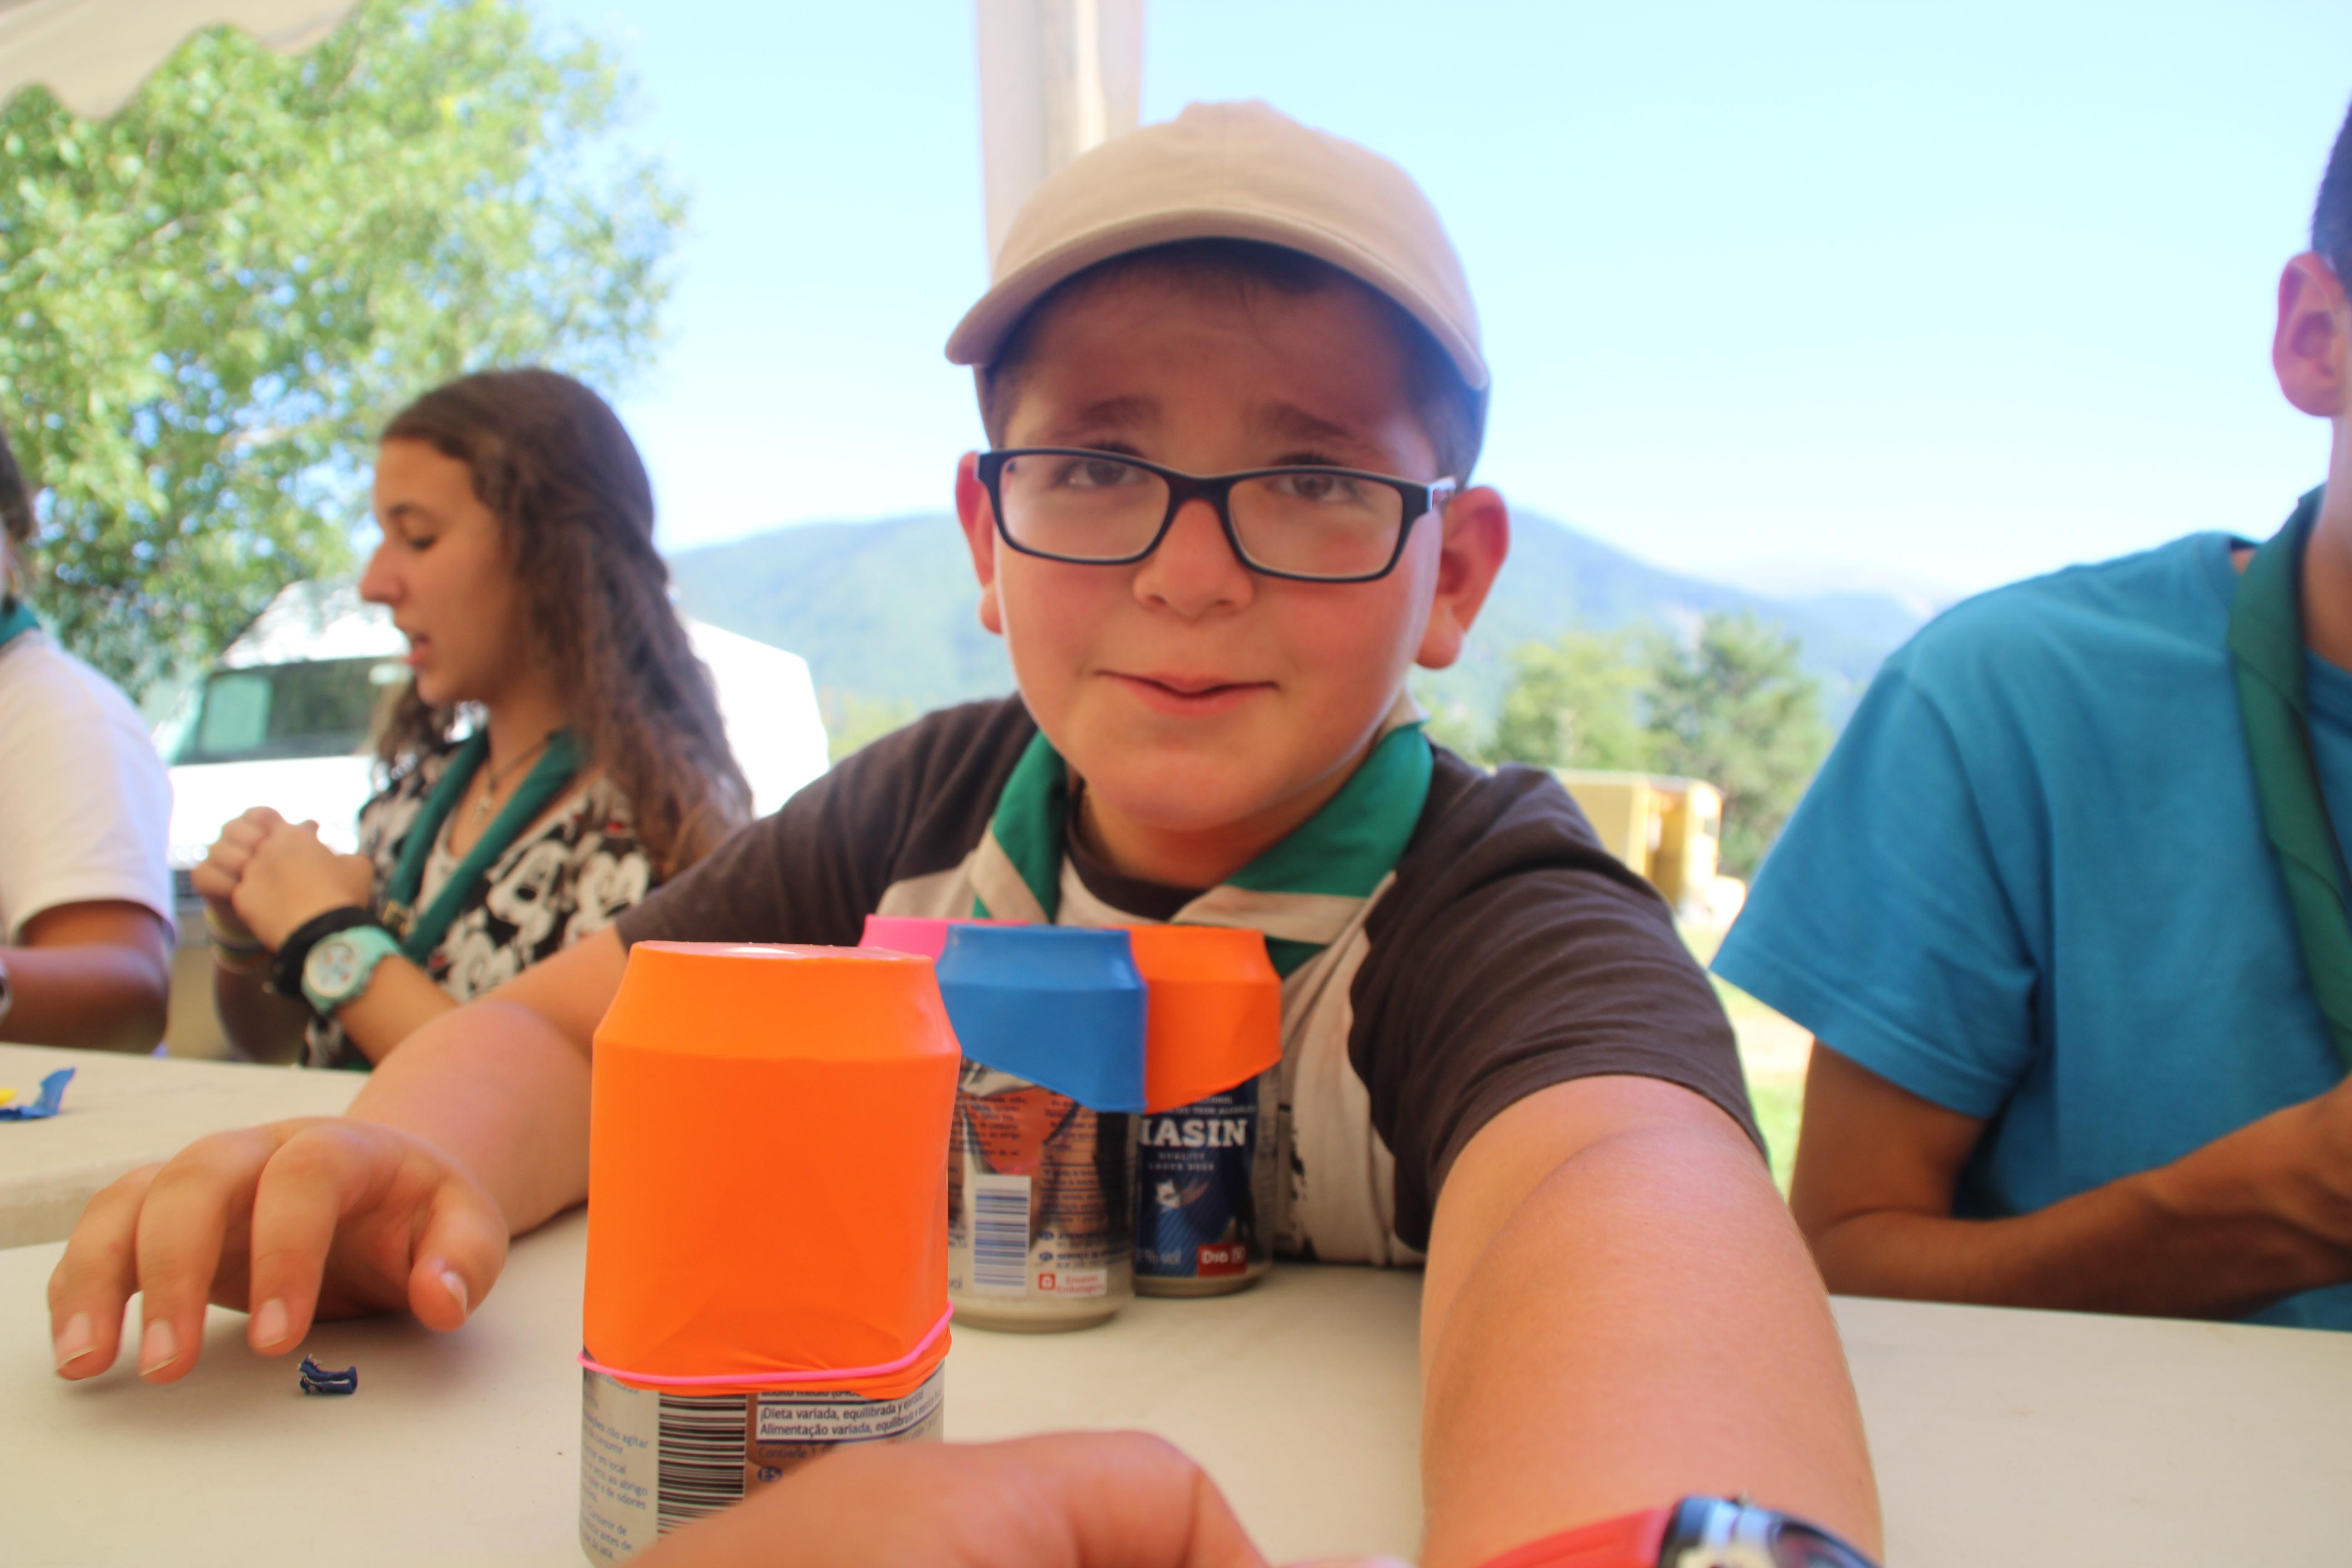 15-16 - Grupo - Campamento de verano - P29